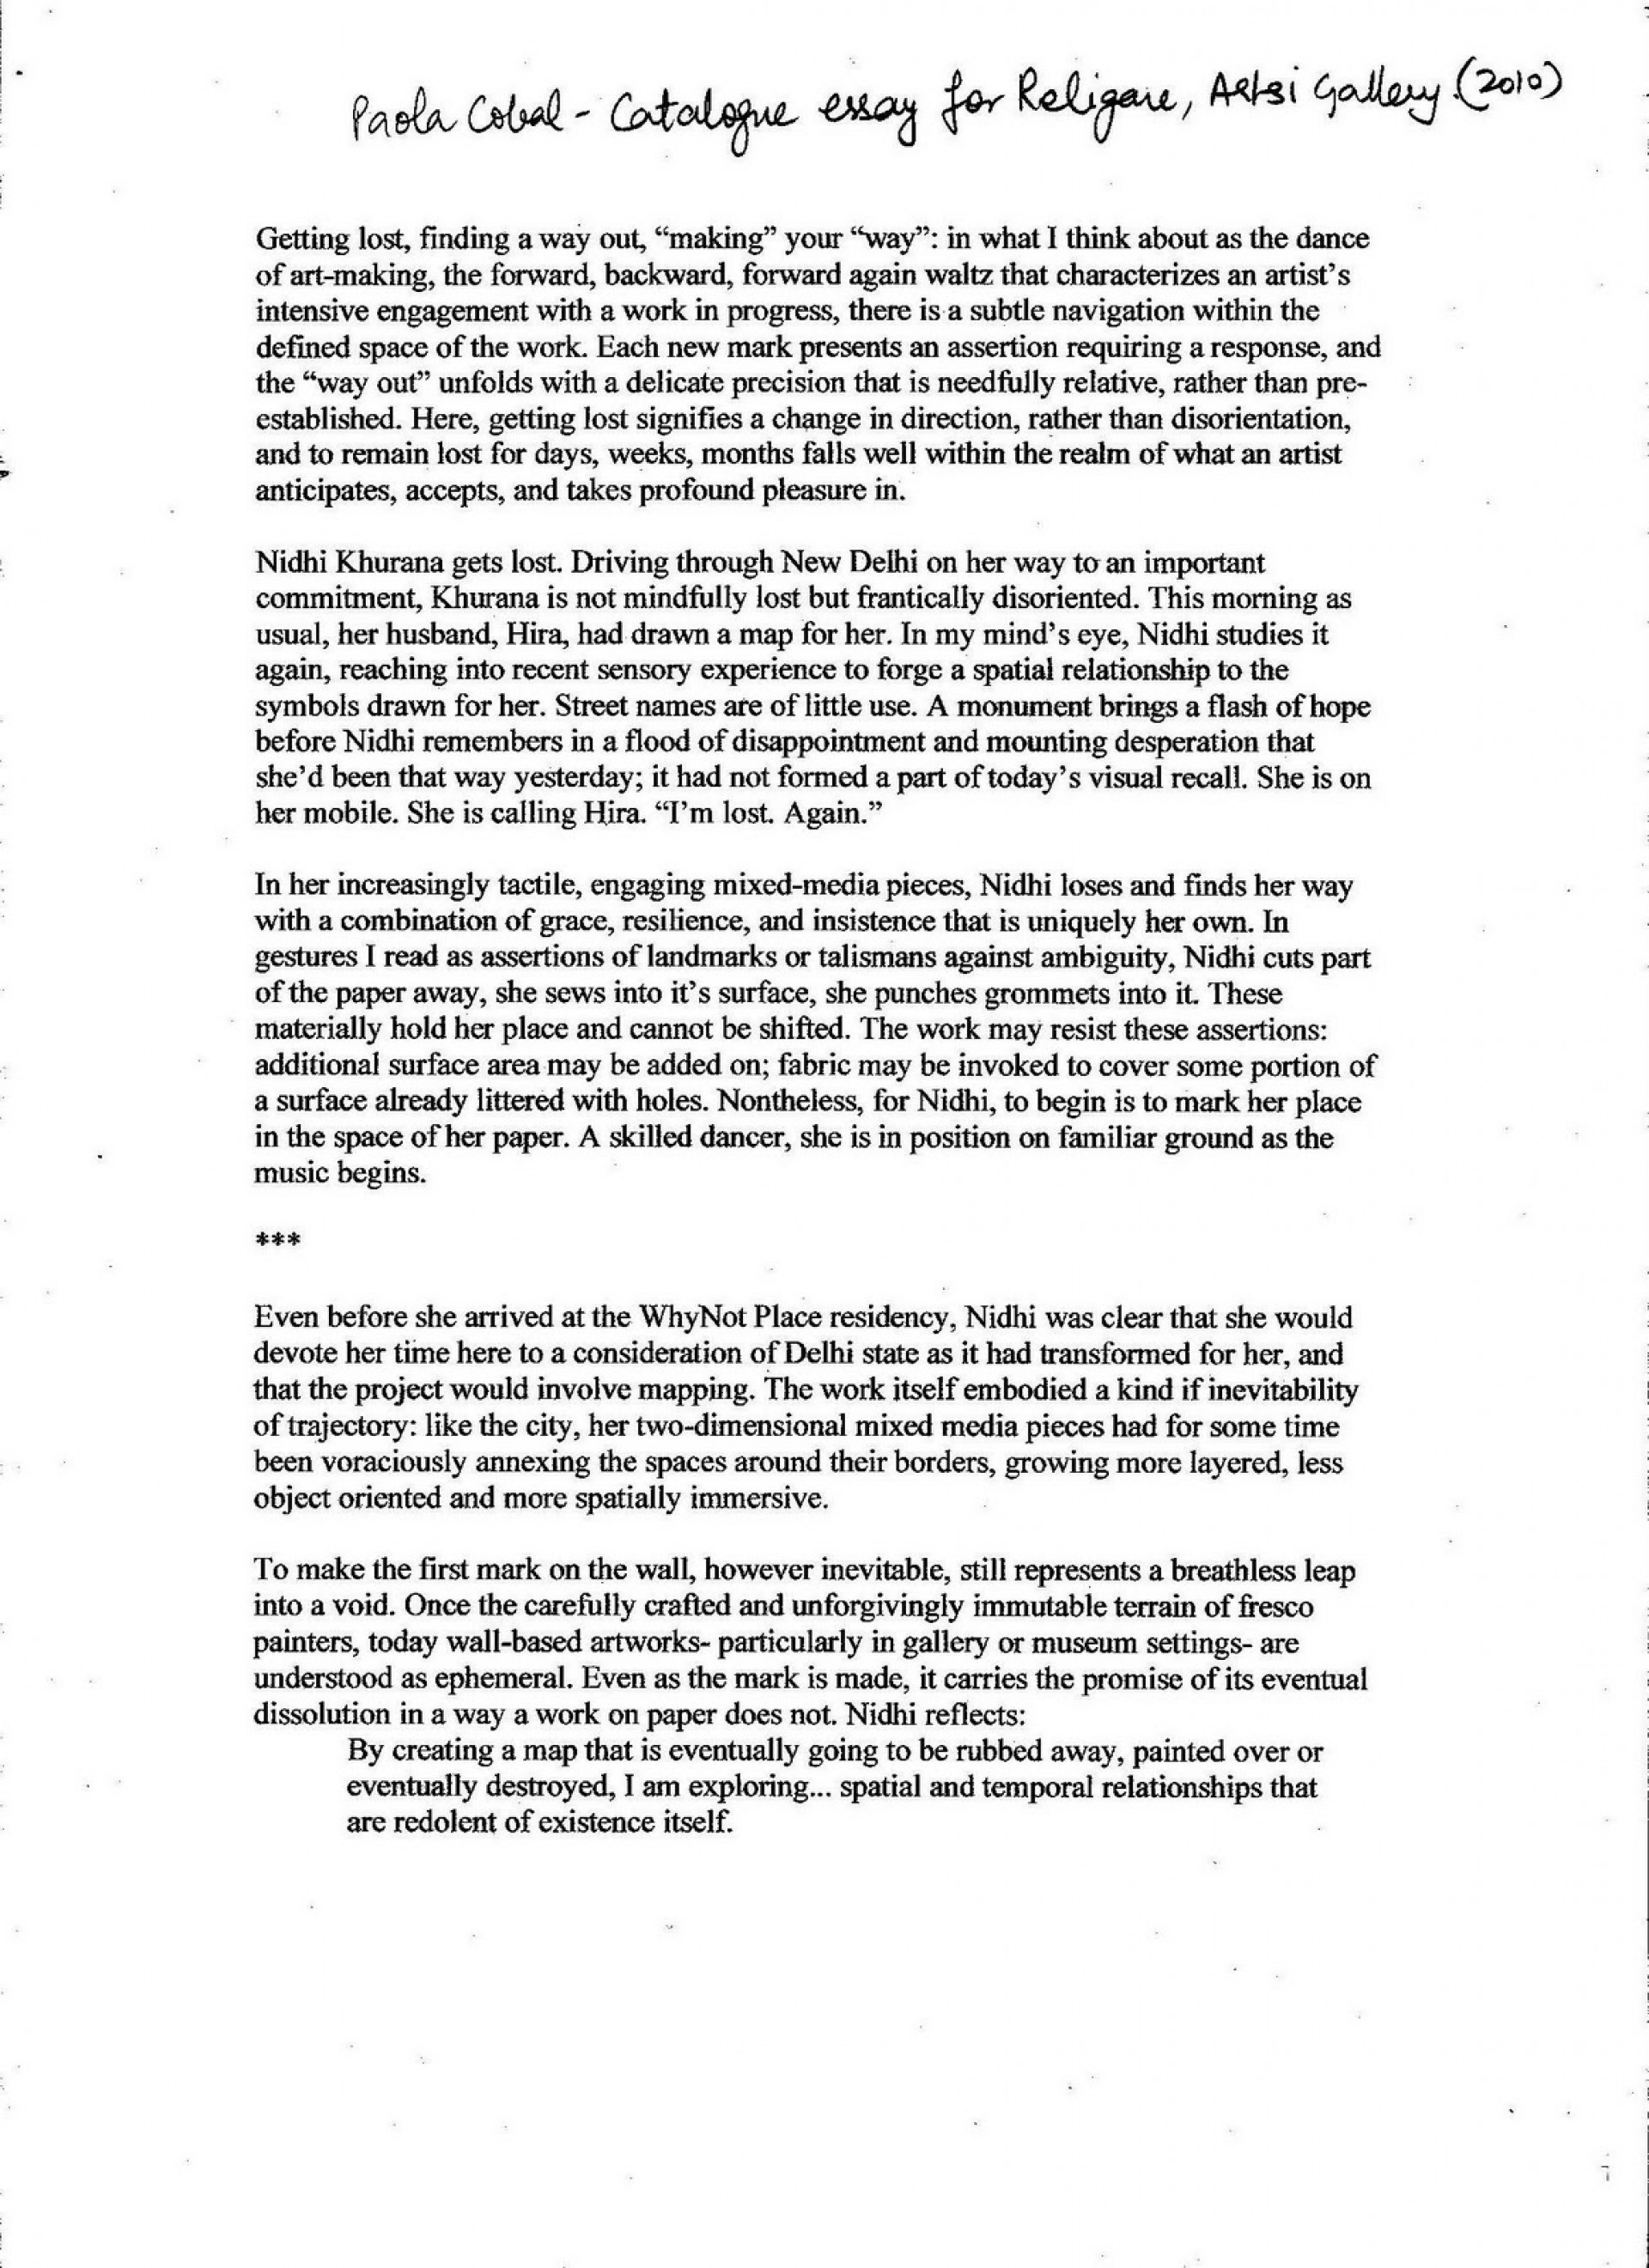 002 Essay Example Paolaessay Beautiful Heros Hero's Journey Titles Heroes Robert Cormier Questions Hero Outline 1920